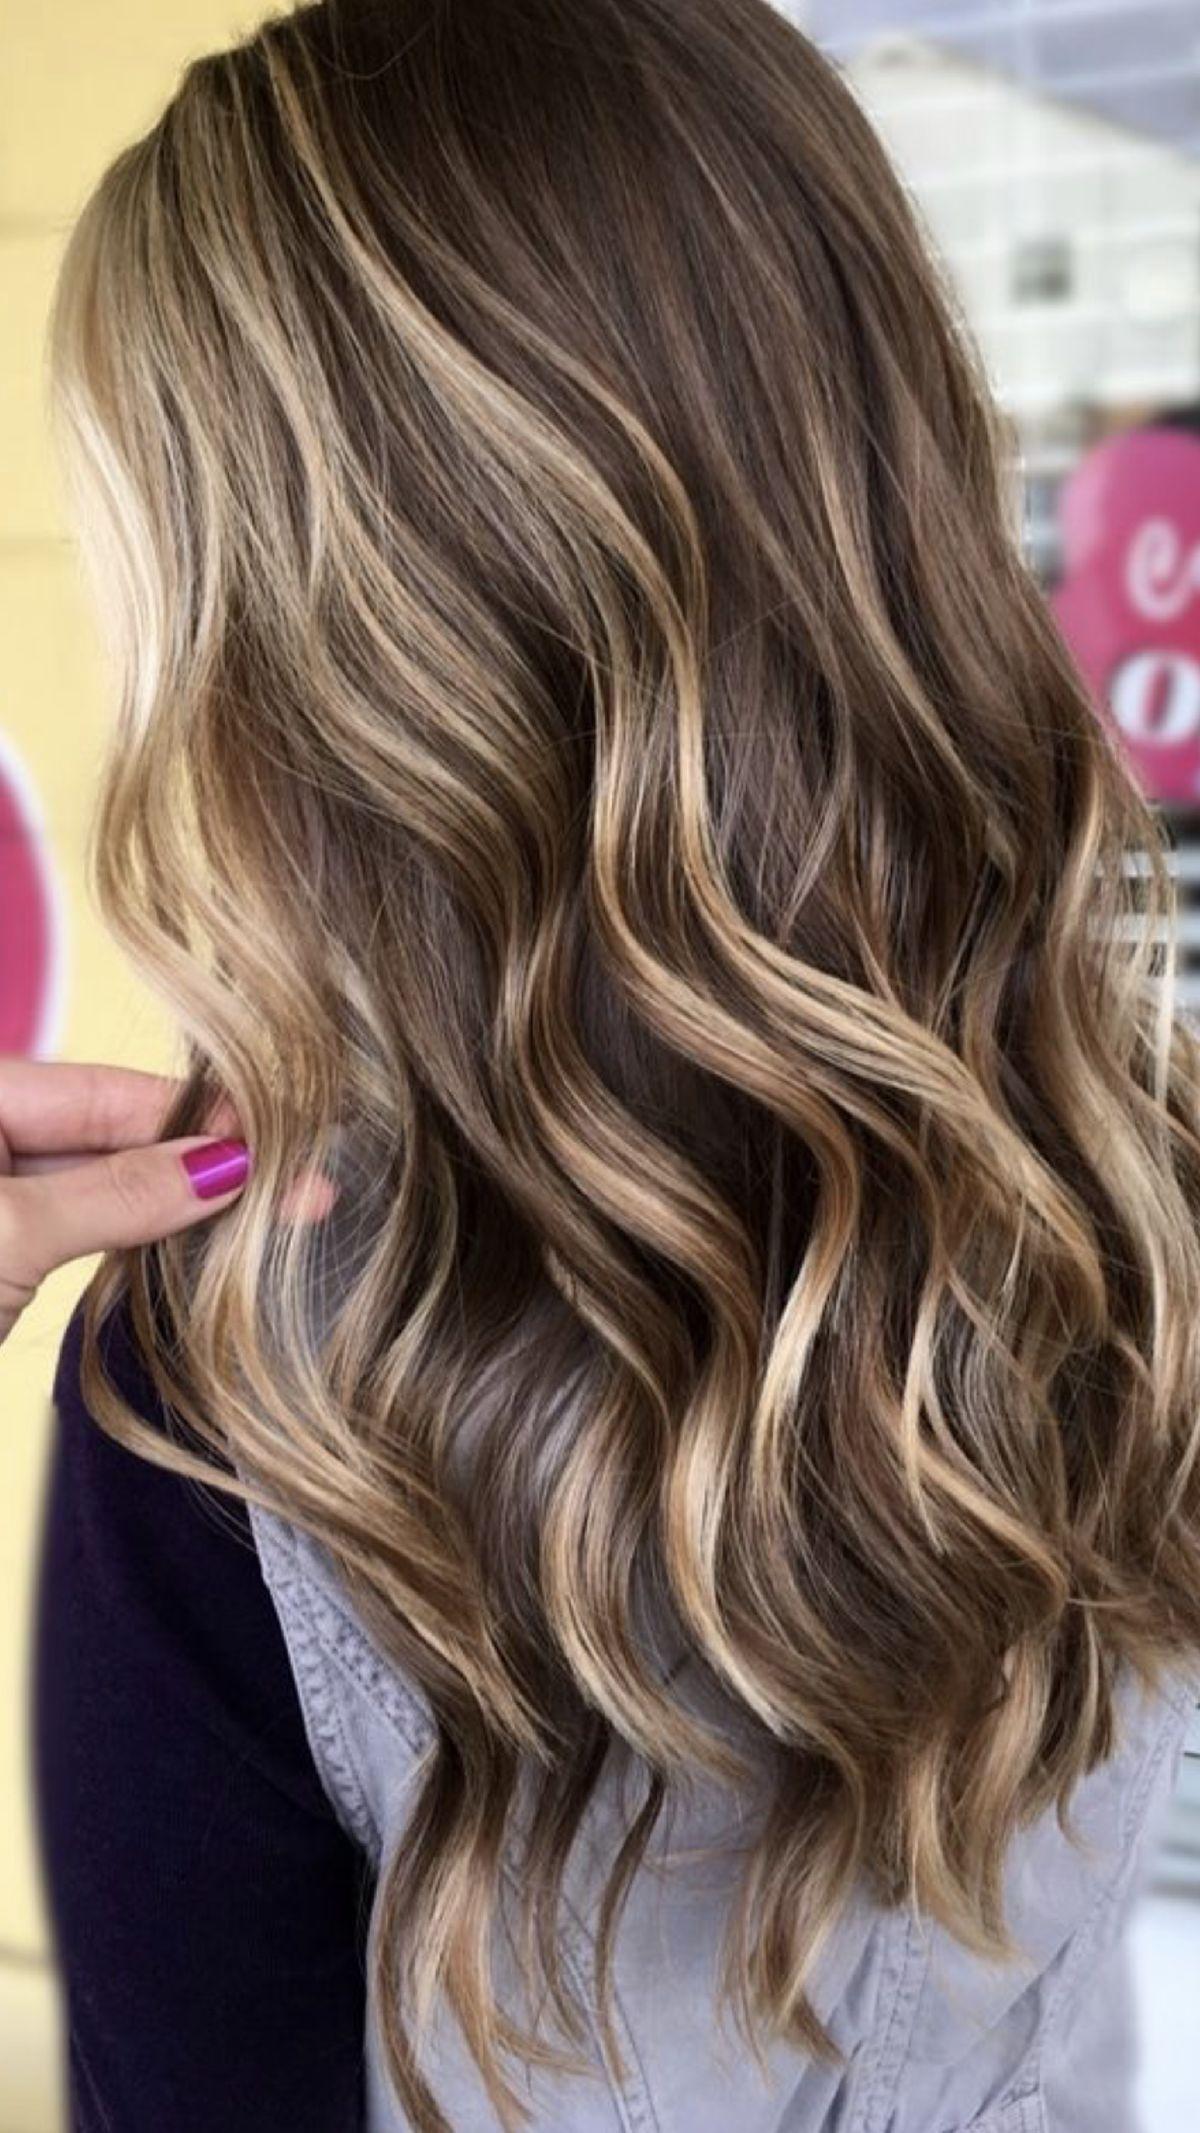 Hair Inspiration 2019-05-13 06:15:26